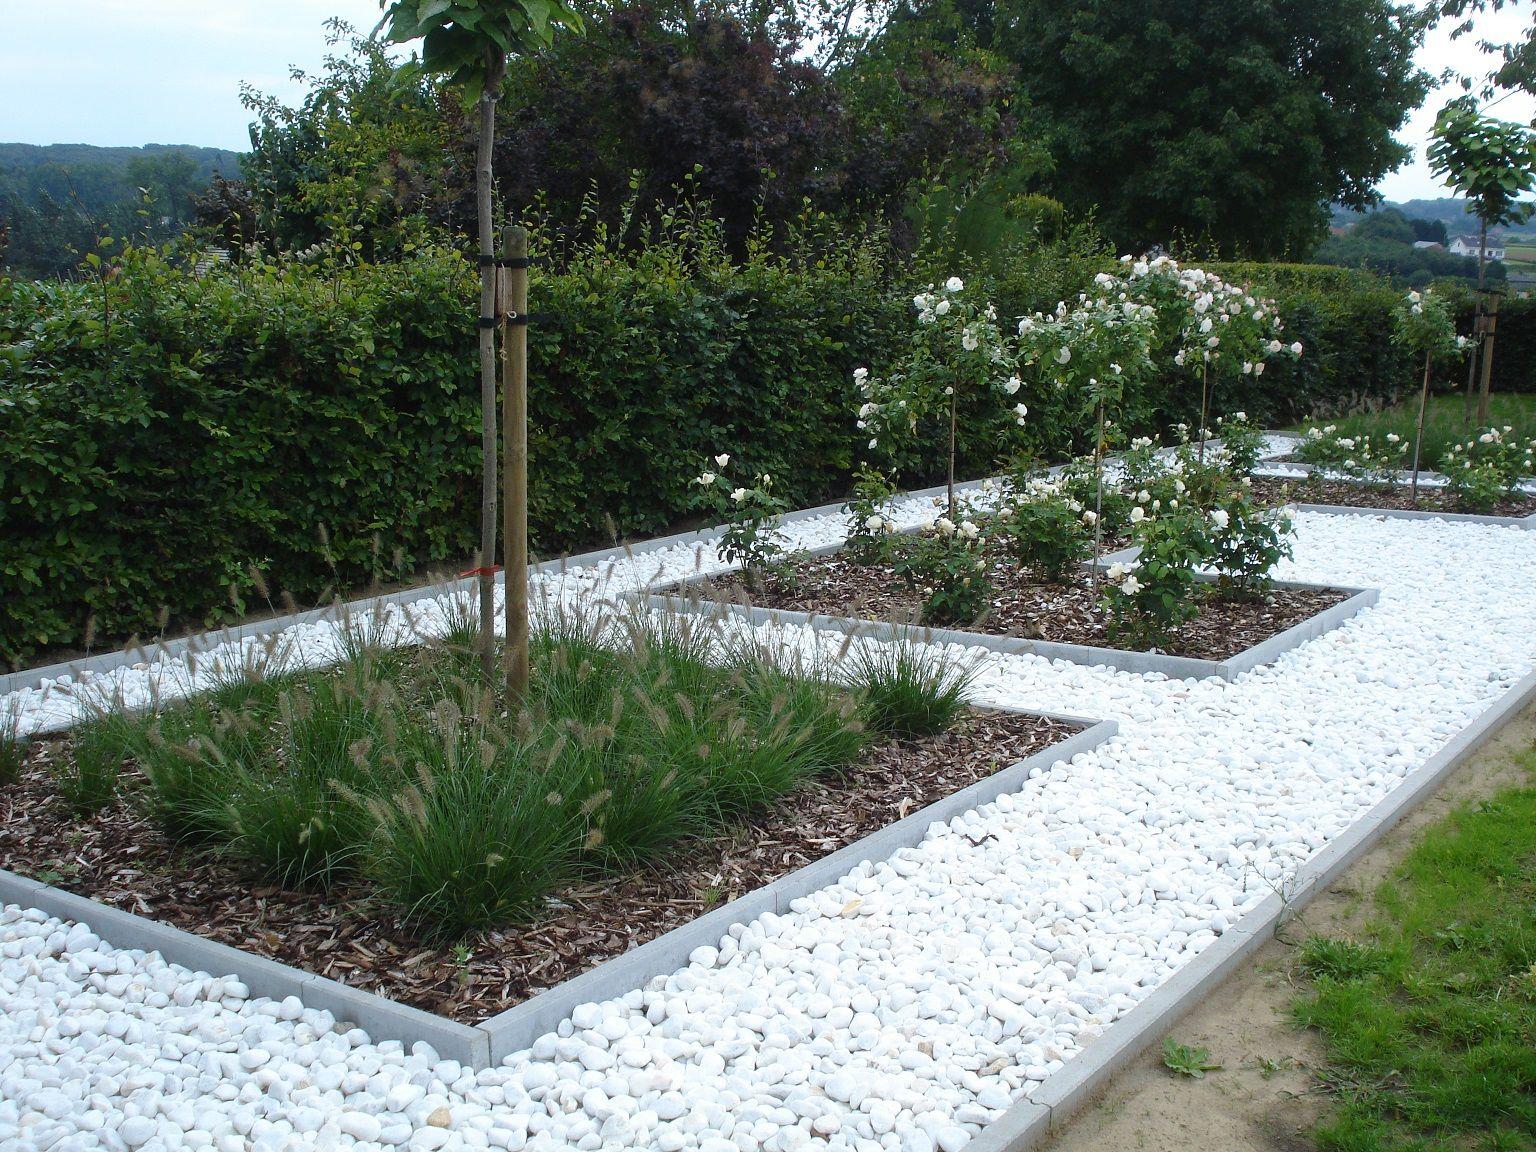 Tuininspiratie: moderne tuin met sneeuwwitte marmergrind via Amagard.com #grind #tuin #tuininspiratie #plantenbakken